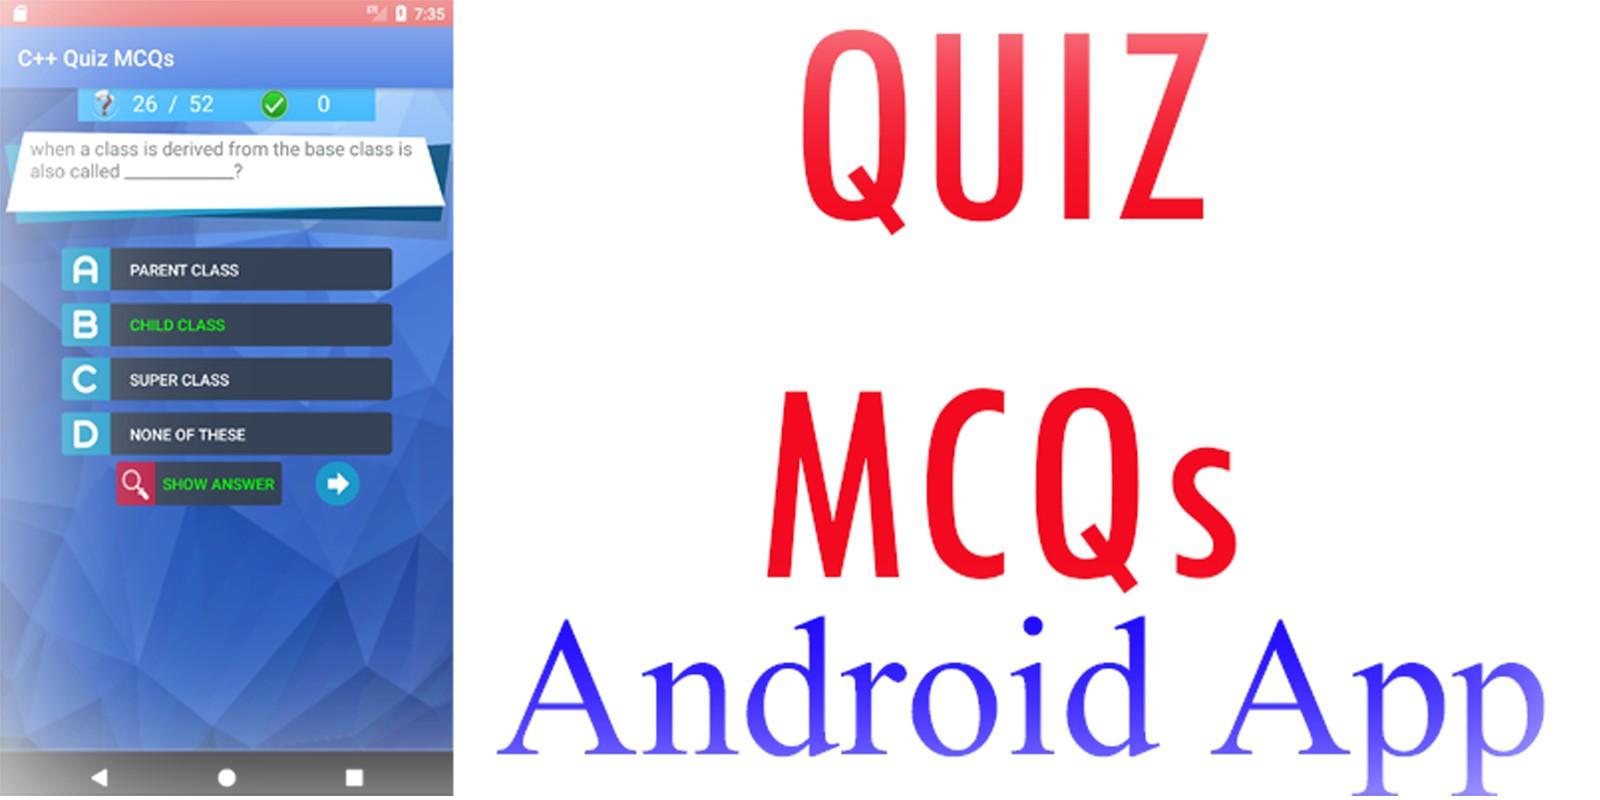 MCQs Quiz Android App Template